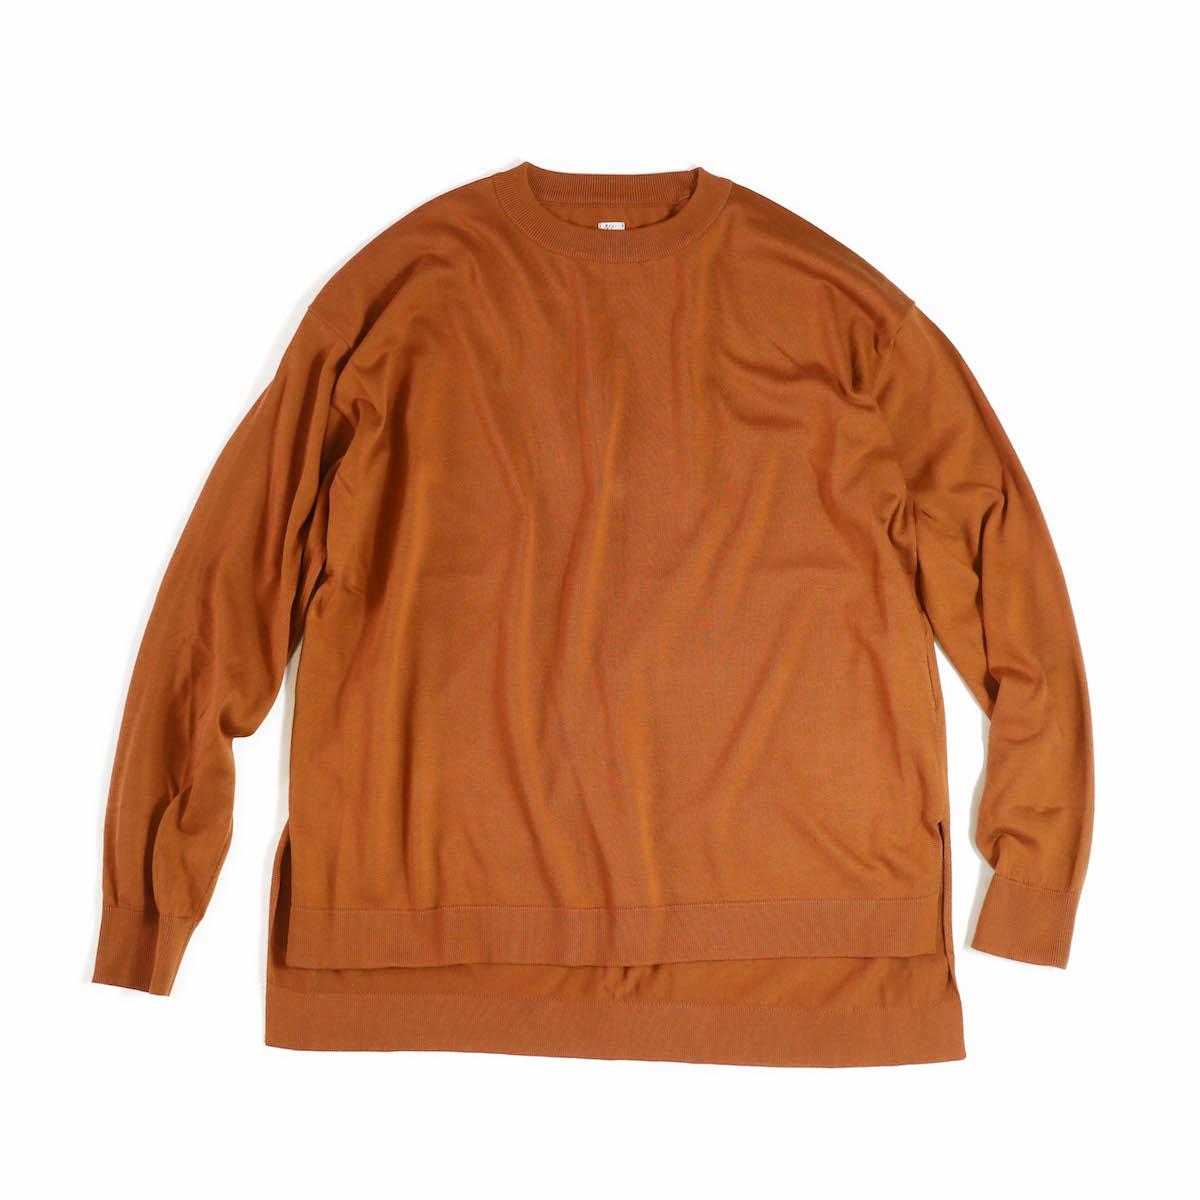 KAPTAIN SUNSHINE / Crewneck Long Sleeved Puollover Knit -OrangeBrown